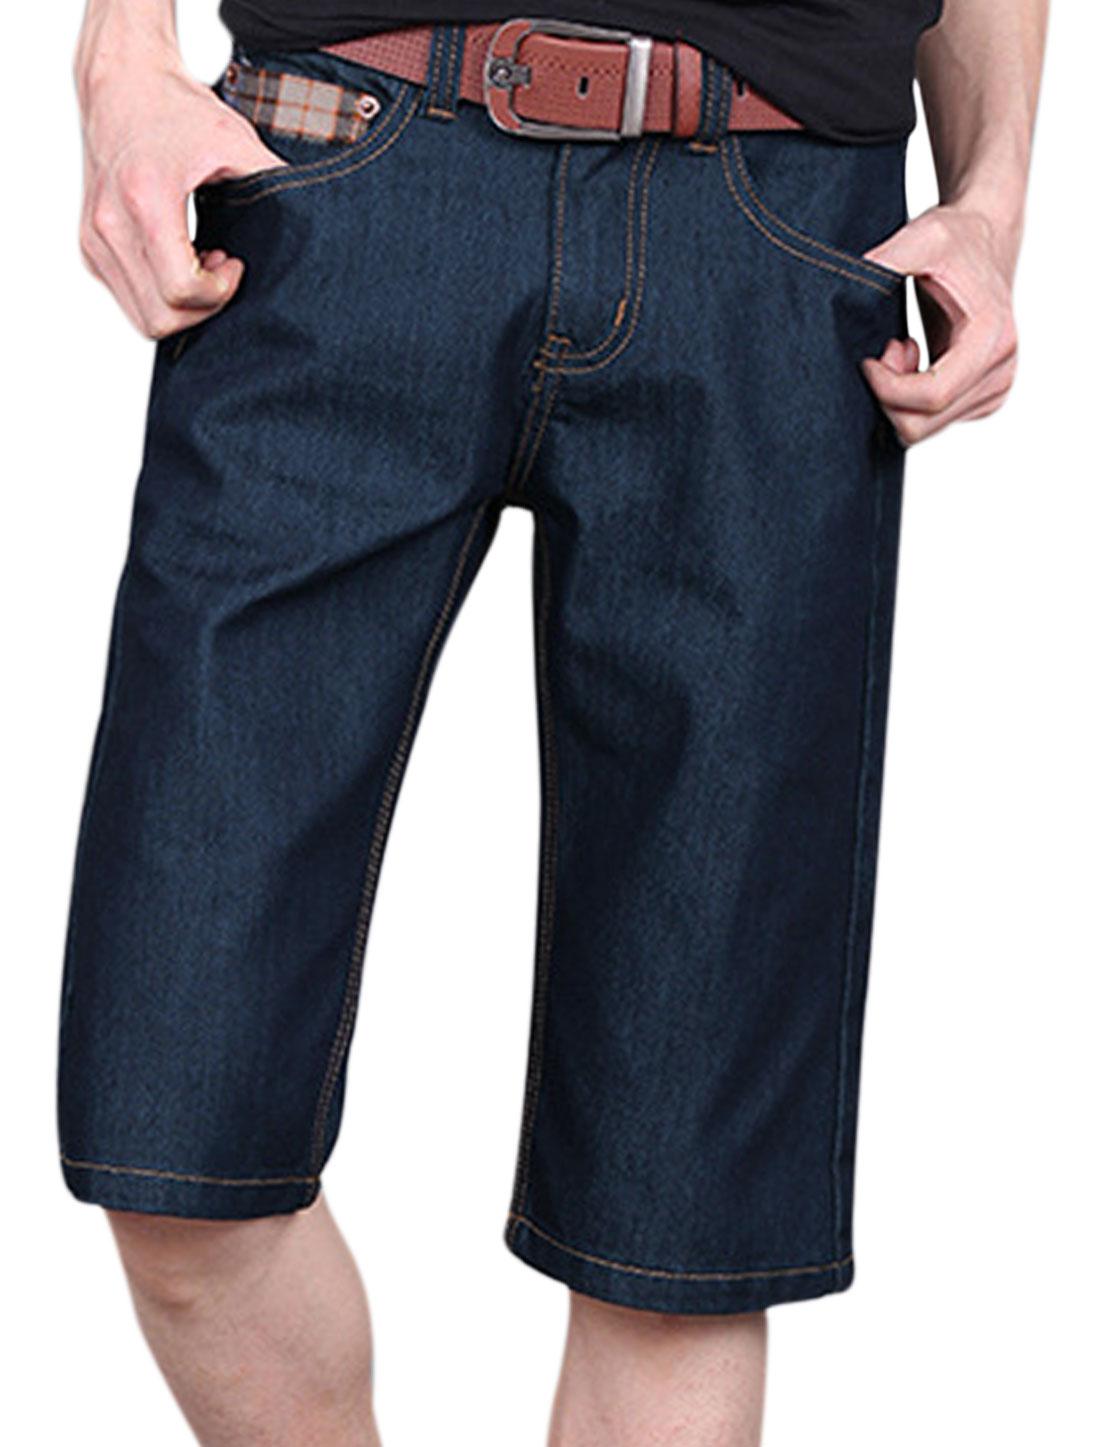 Men Plaids Detail Belt Loop Hip Pockets Mid Rise Denim Shorts Navy Blue W34